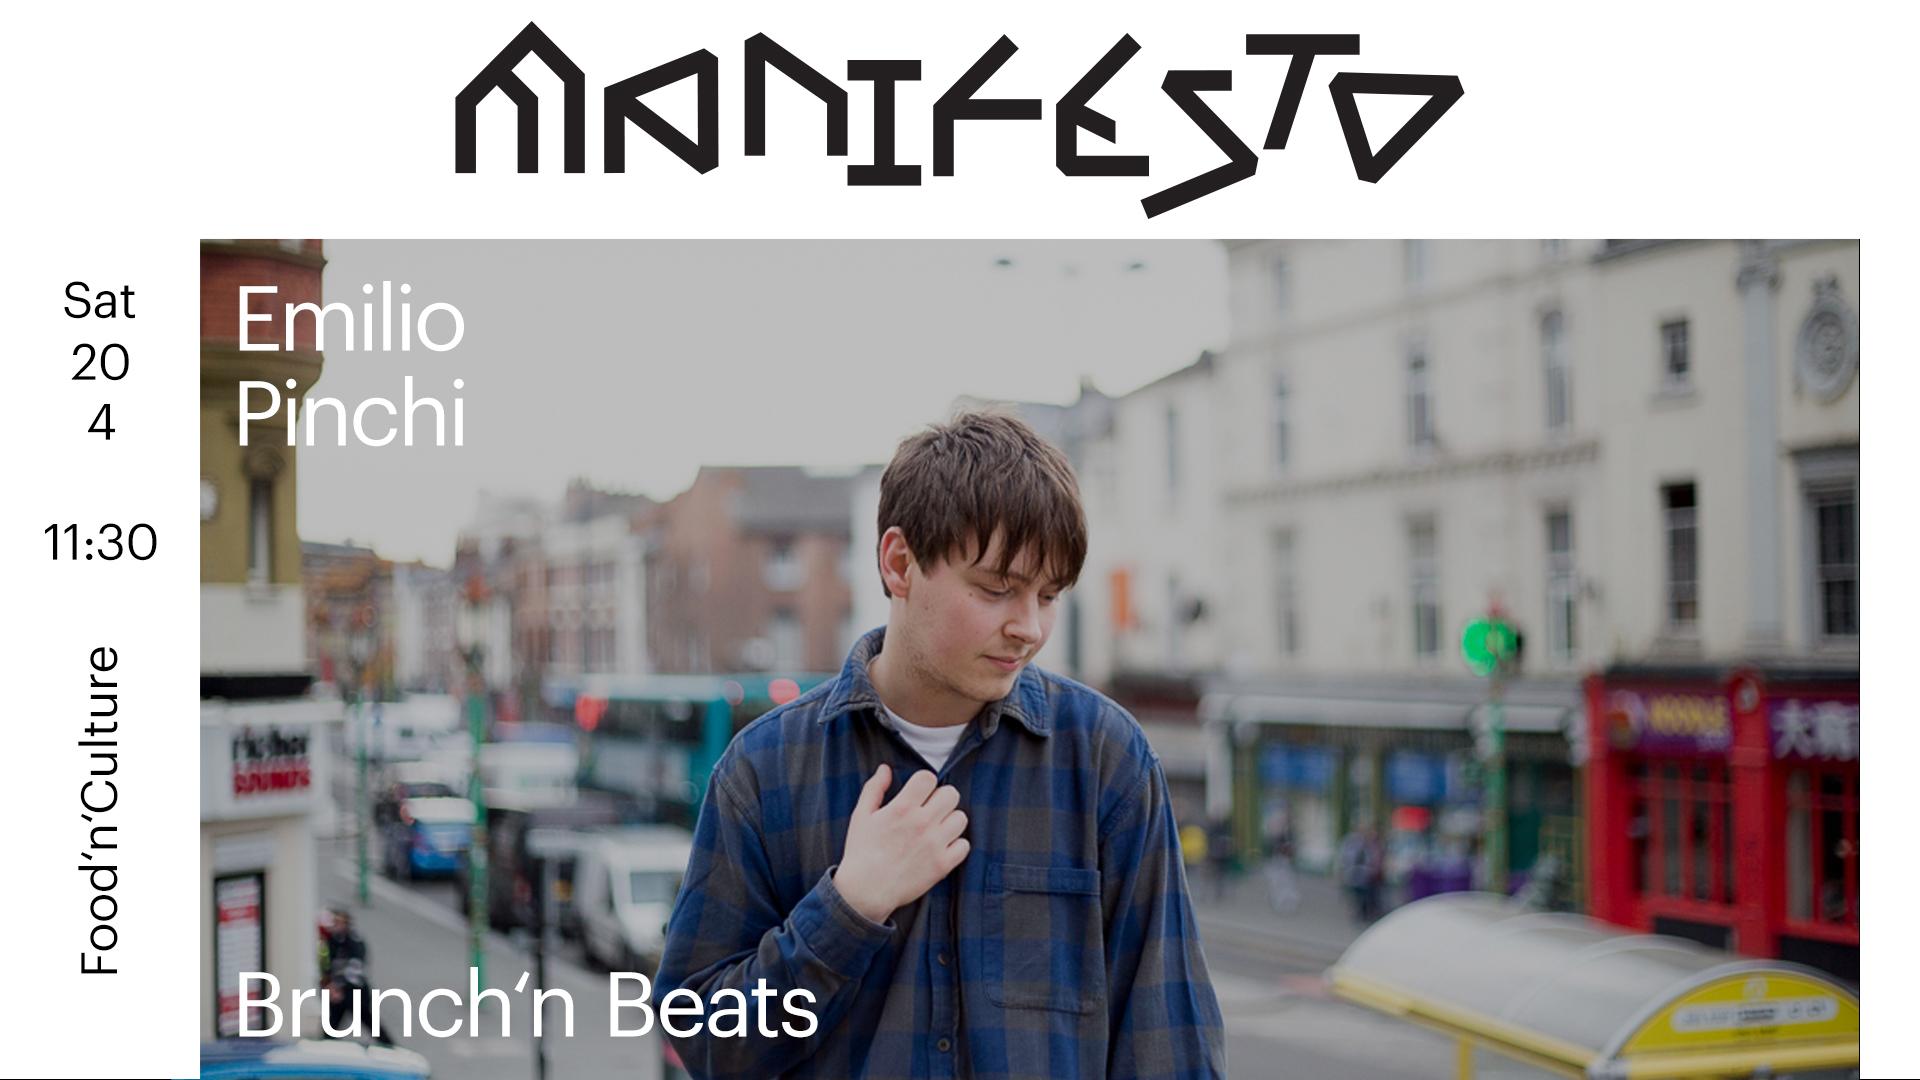 manifesto_2019-FB_EVENT-BrunchnBeats.jpg